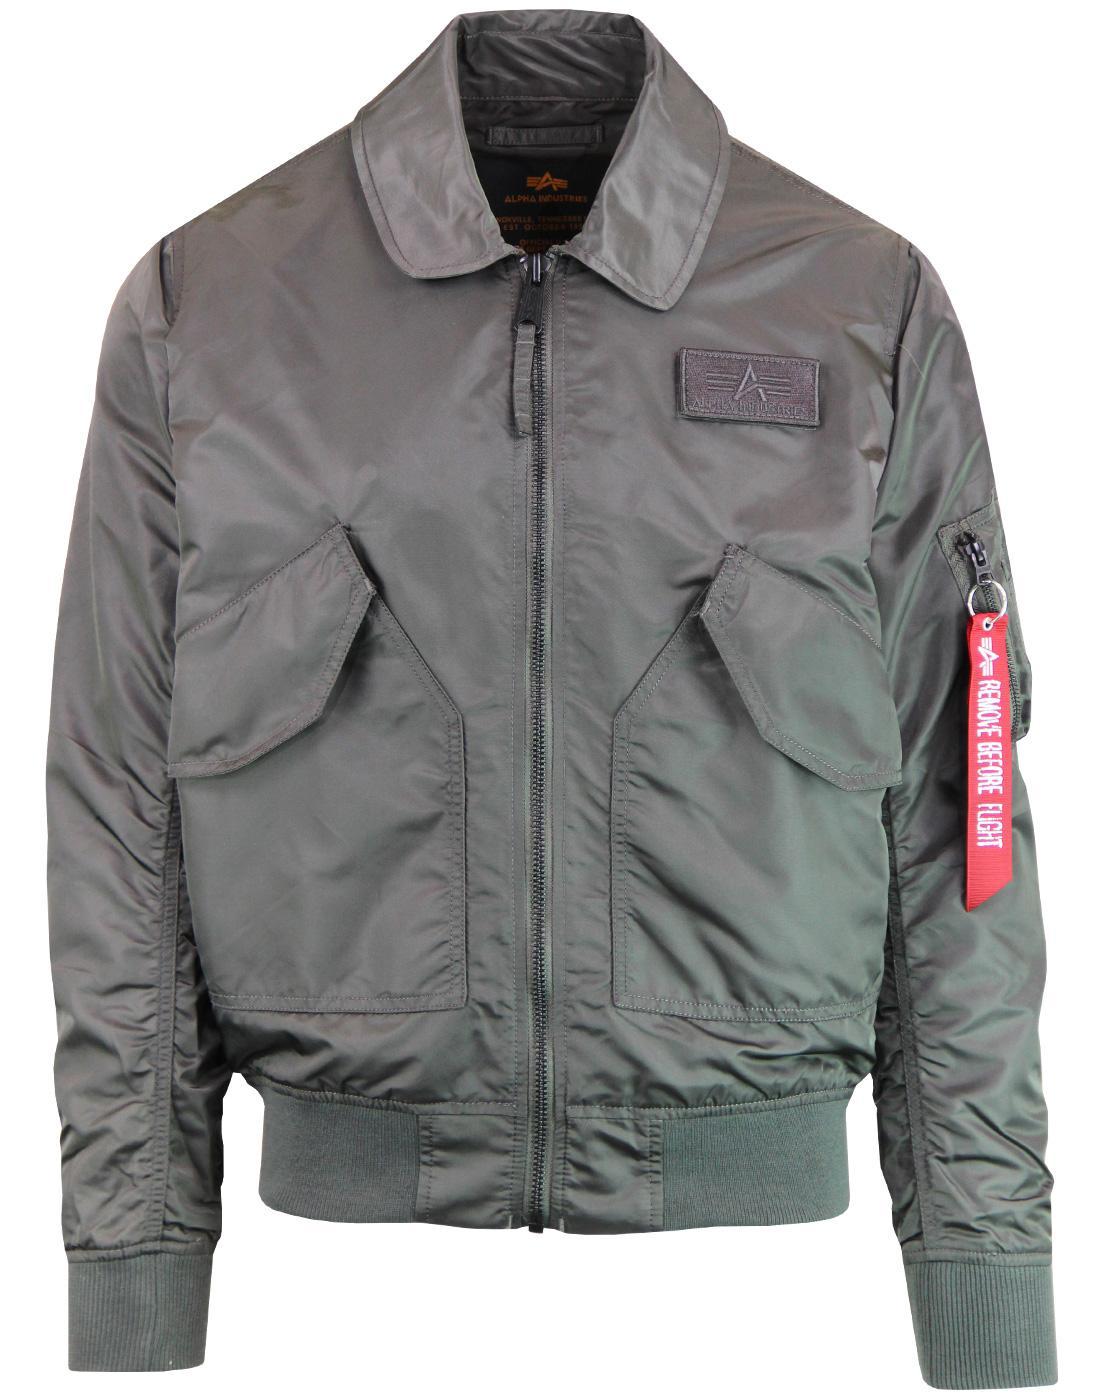 CWU LW PM ALPHA INDUSTRIES Retro Mod Flight Jacket